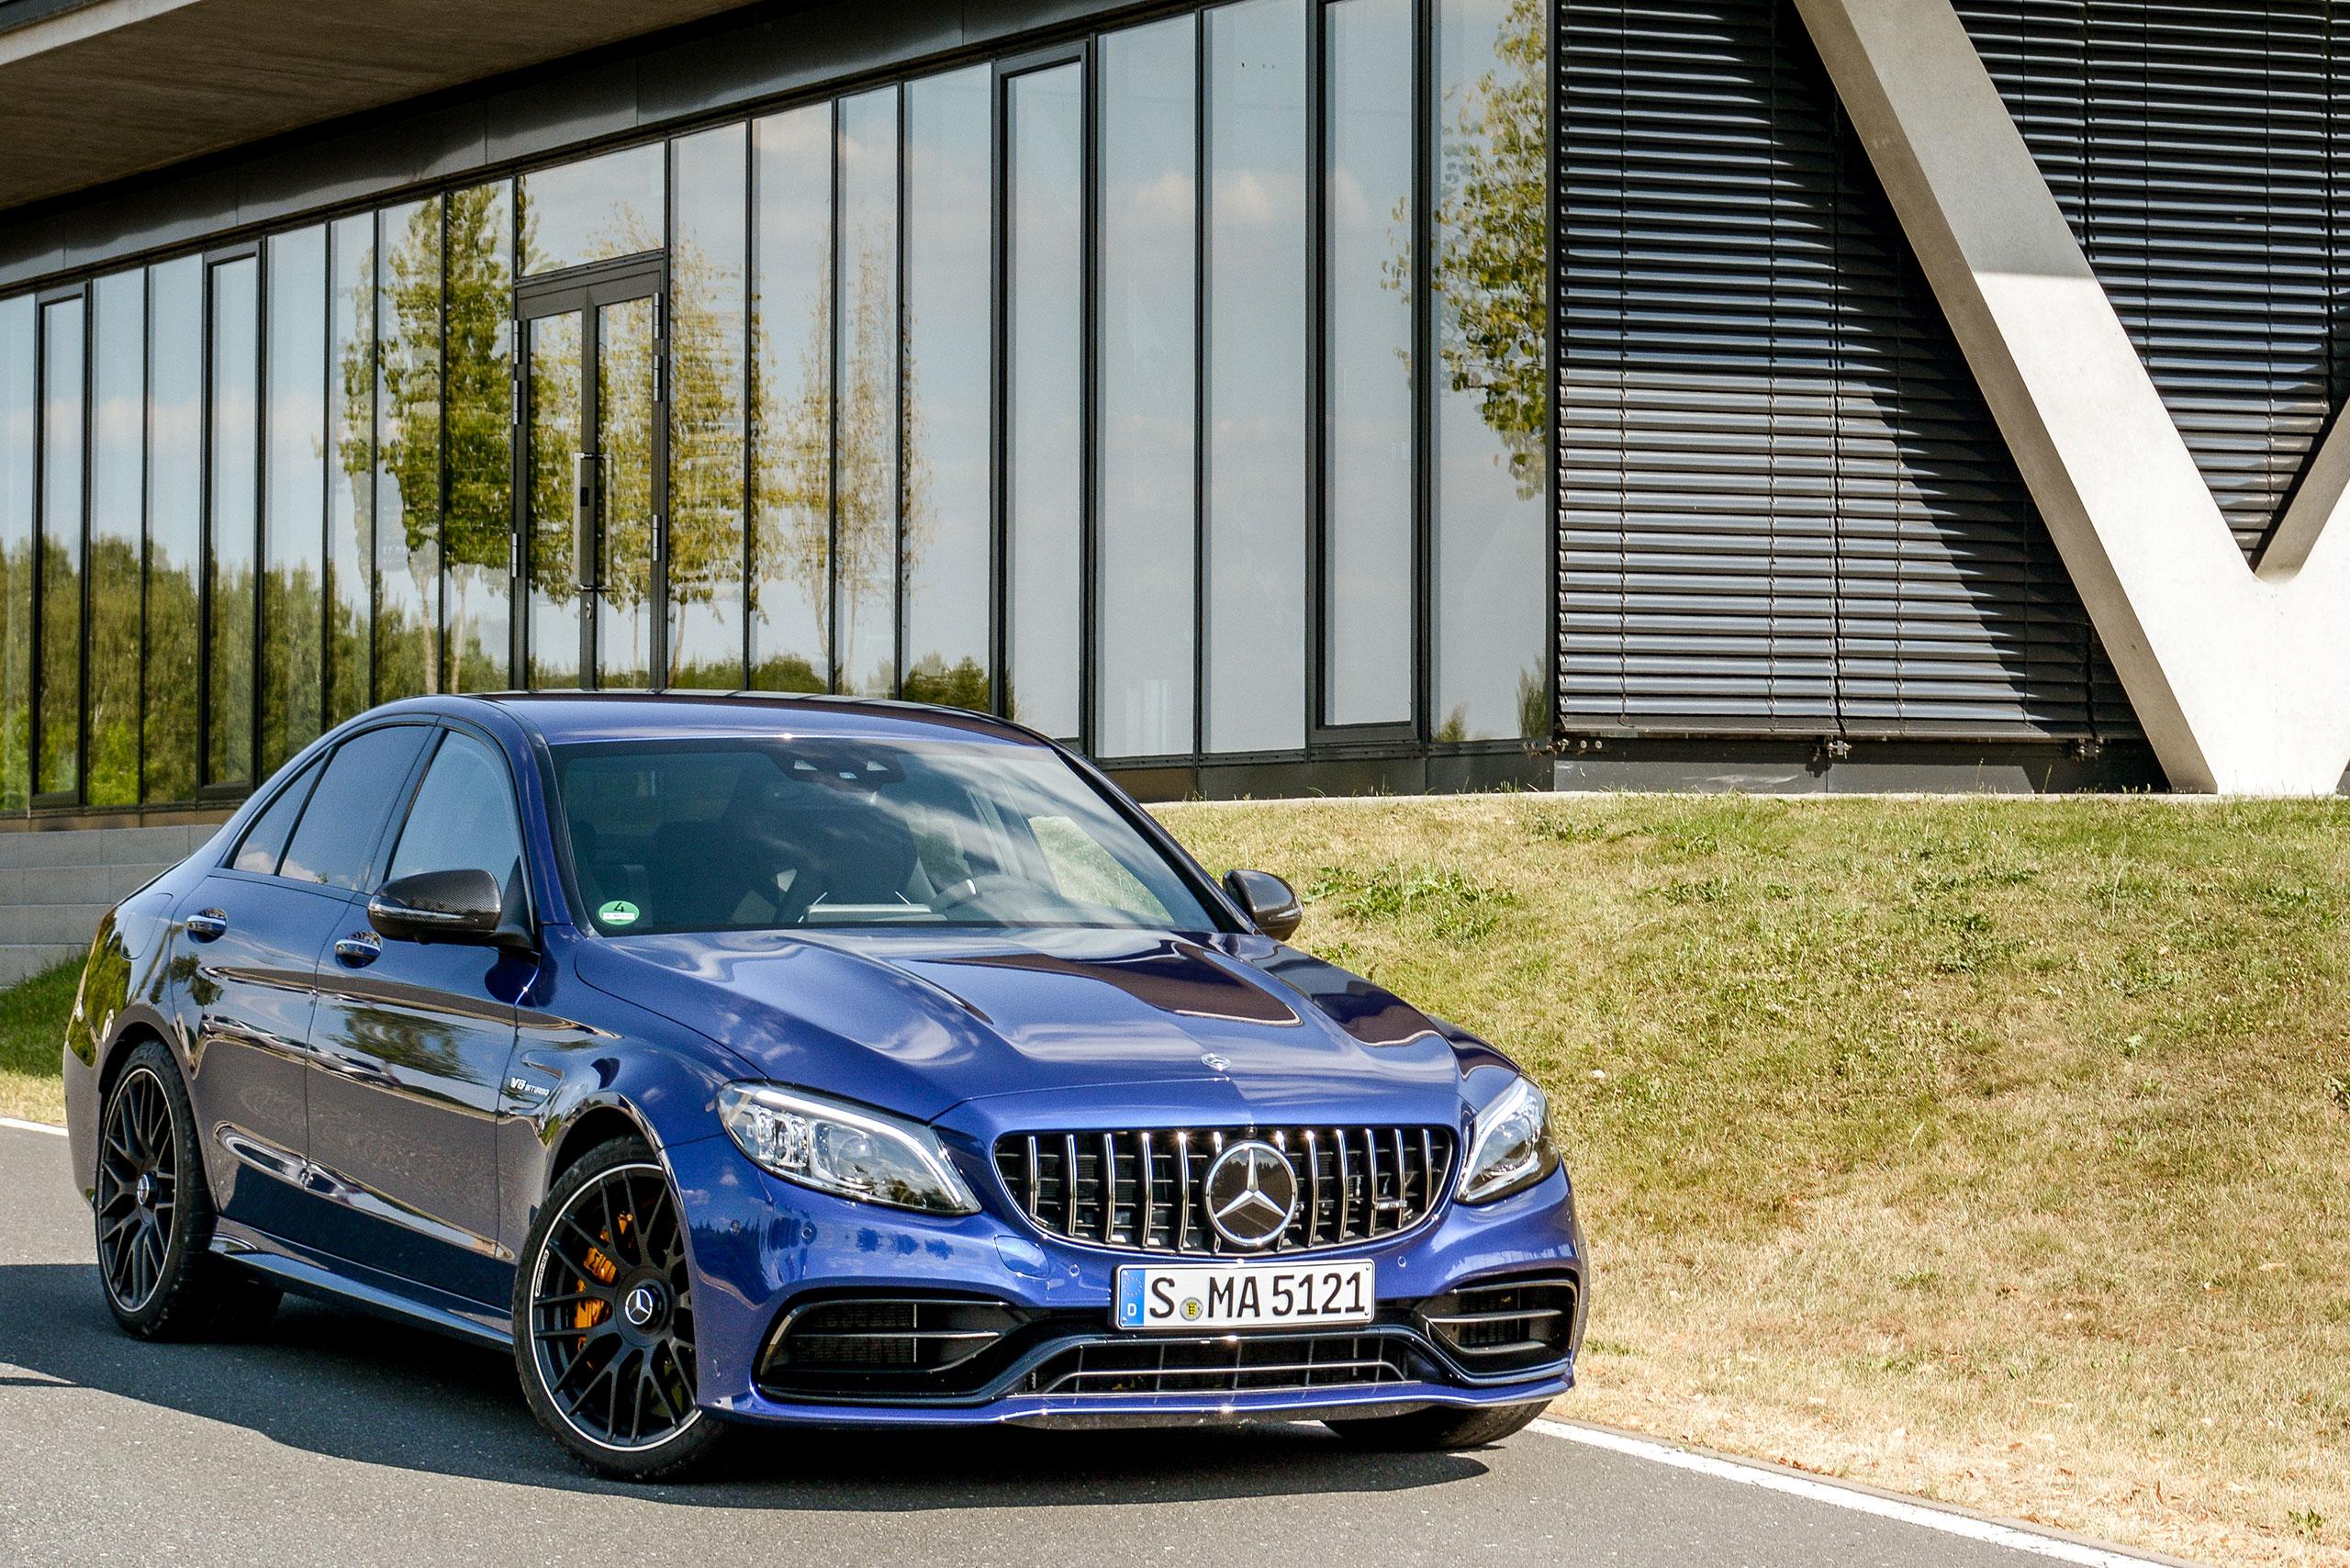 Harte Kerle Test Der 2019er Mercedes Amg C 63 S Modelle Luxify